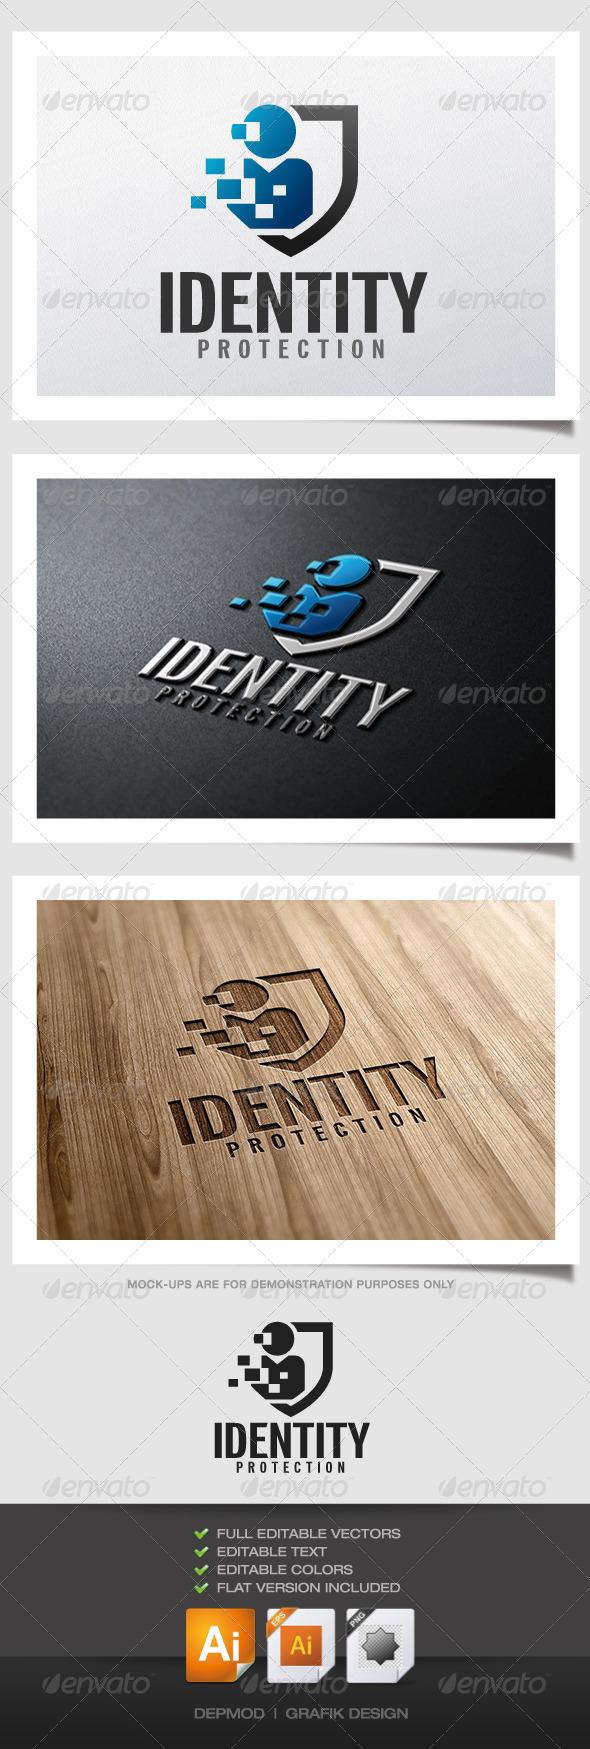 Identity Protection Logo - Symbols Logo Templates